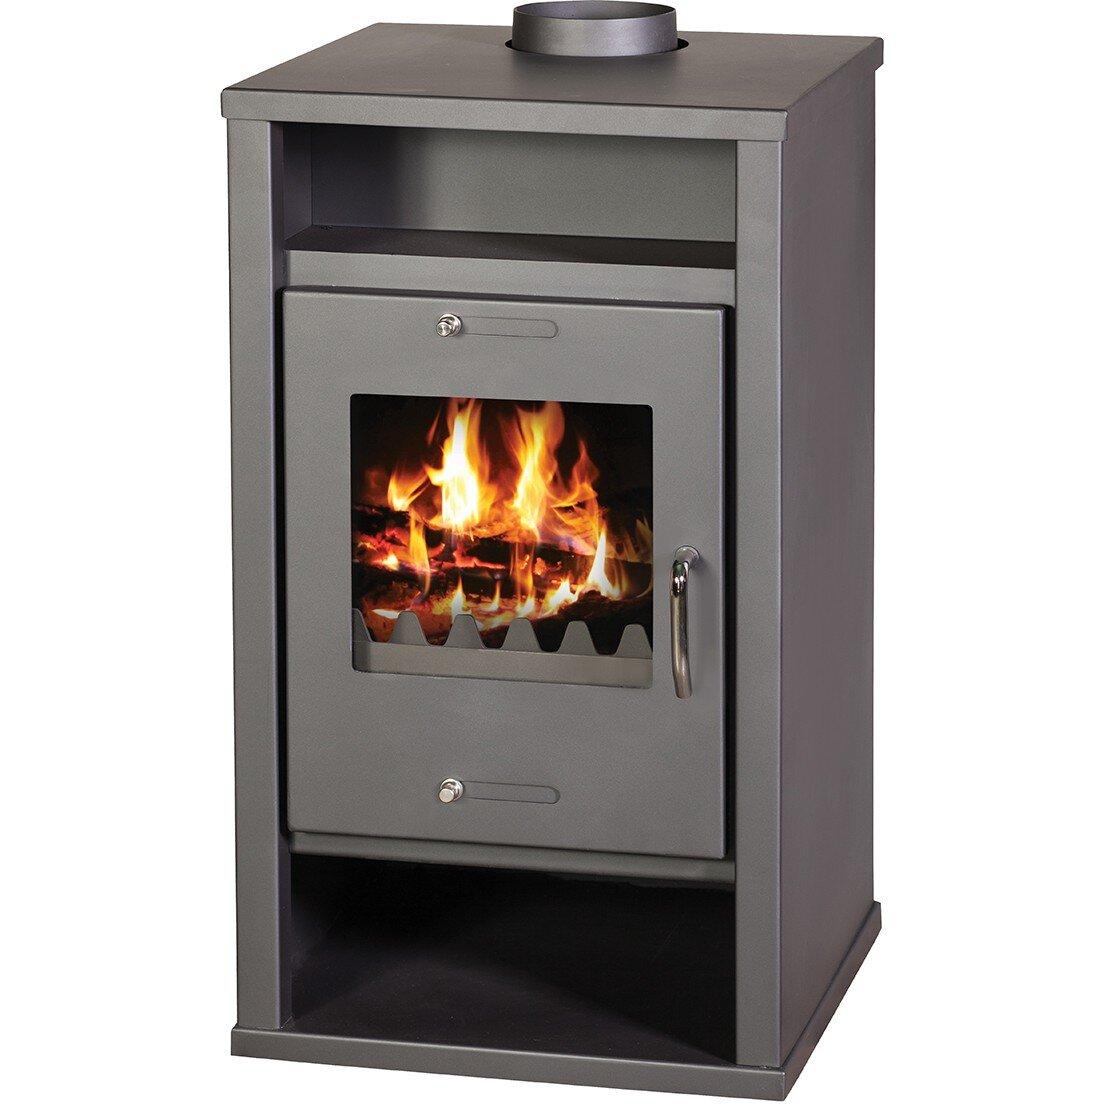 Soba pe lemne tip centrala termica Victoria Deluxe B, capacitate 12 kW, clasa A, eficienta 73%, culoare gri